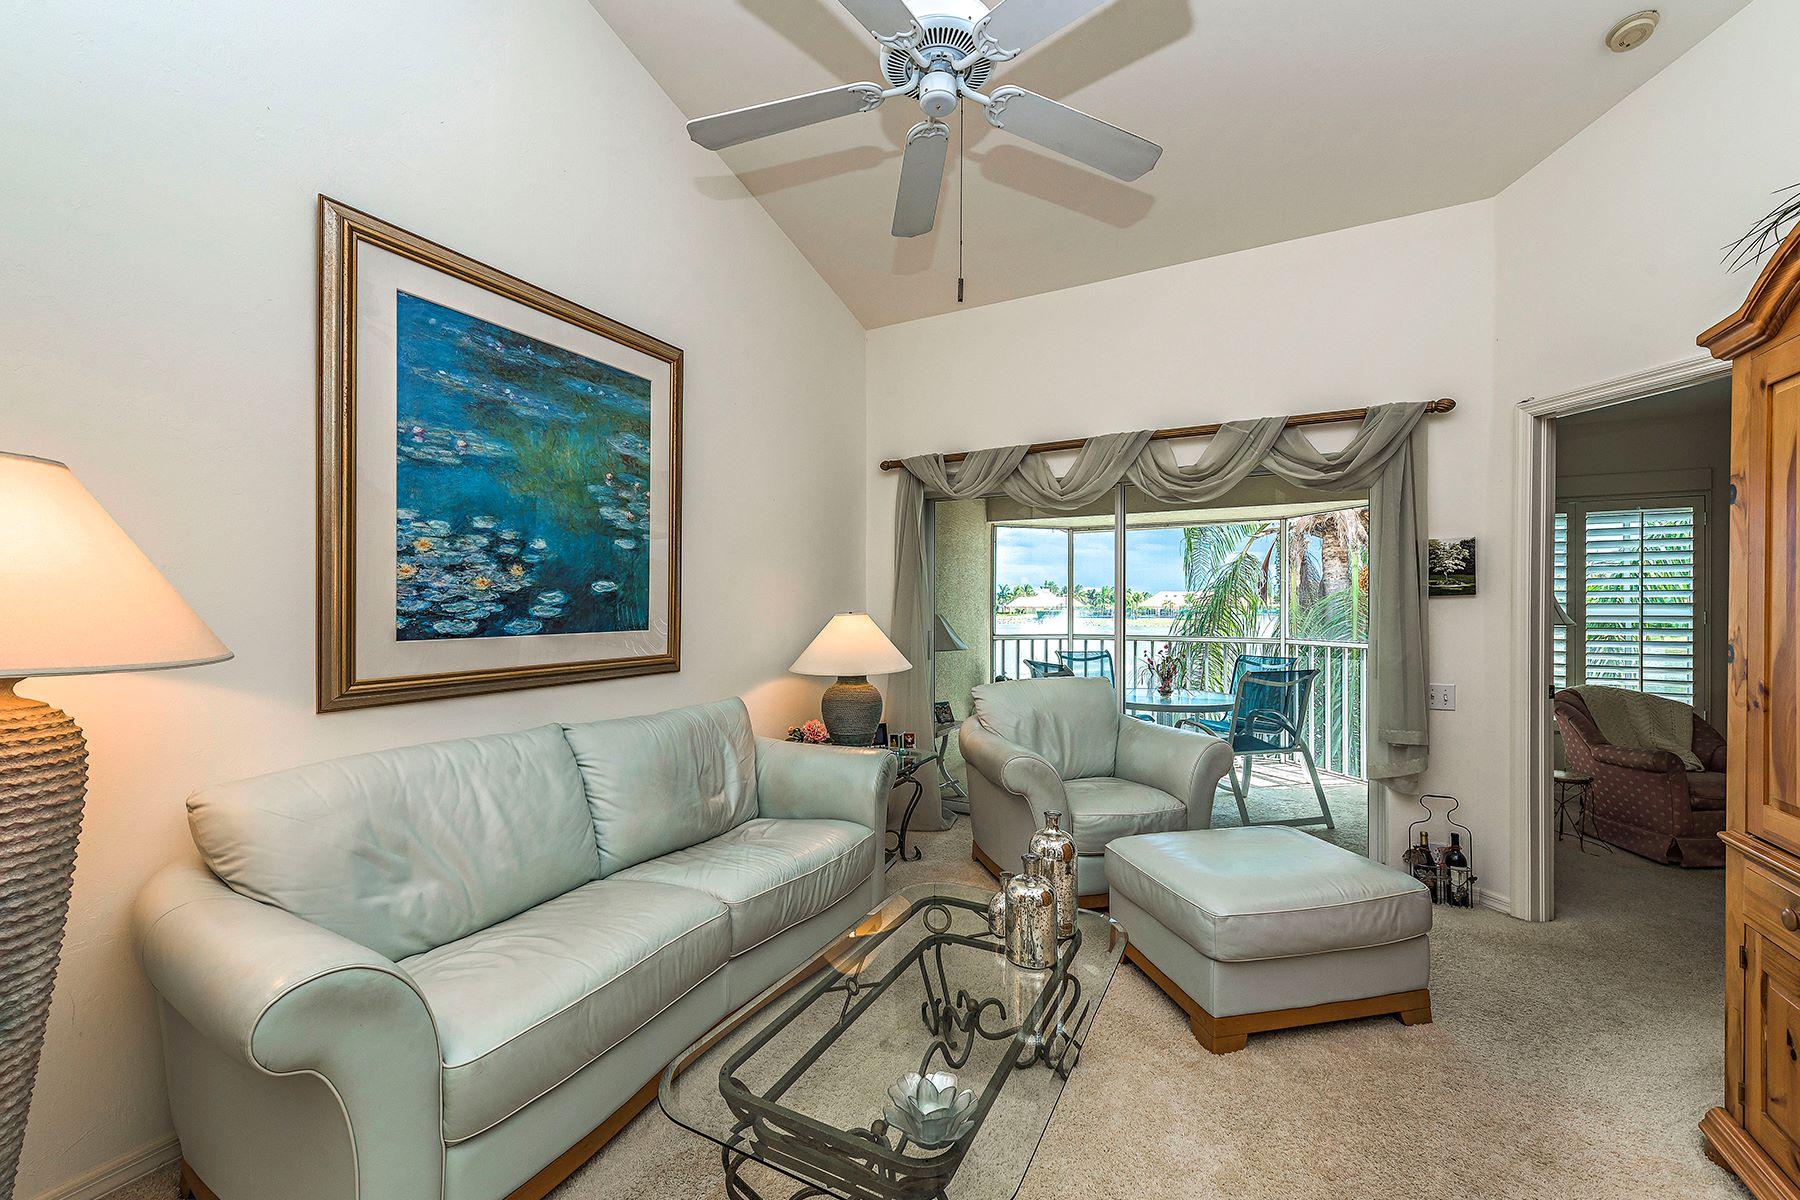 Condomínio para Venda às WORTHINGTON 13640 Worthington Way 1908 Bonita Springs, Florida, 34135 Estados Unidos